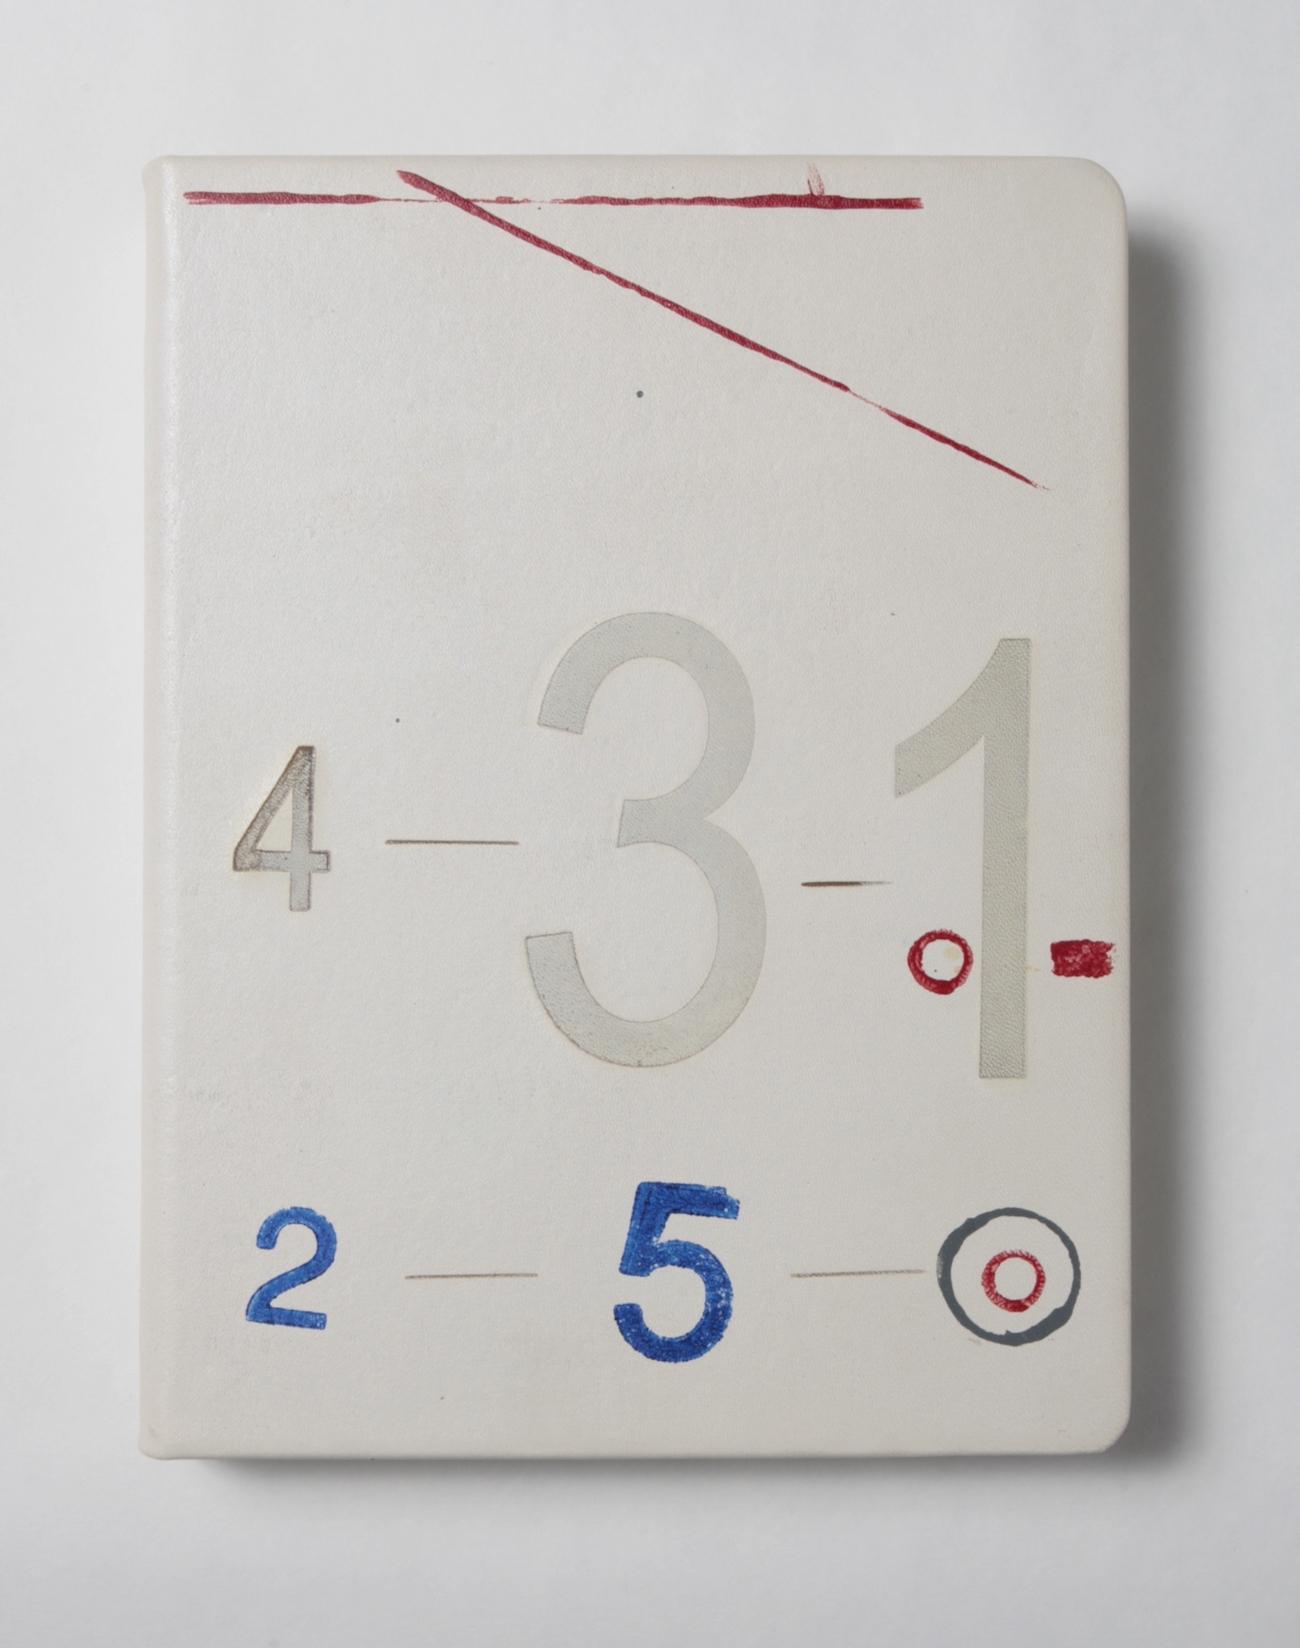 Reisebuch 1-5, Special Edition, 2008